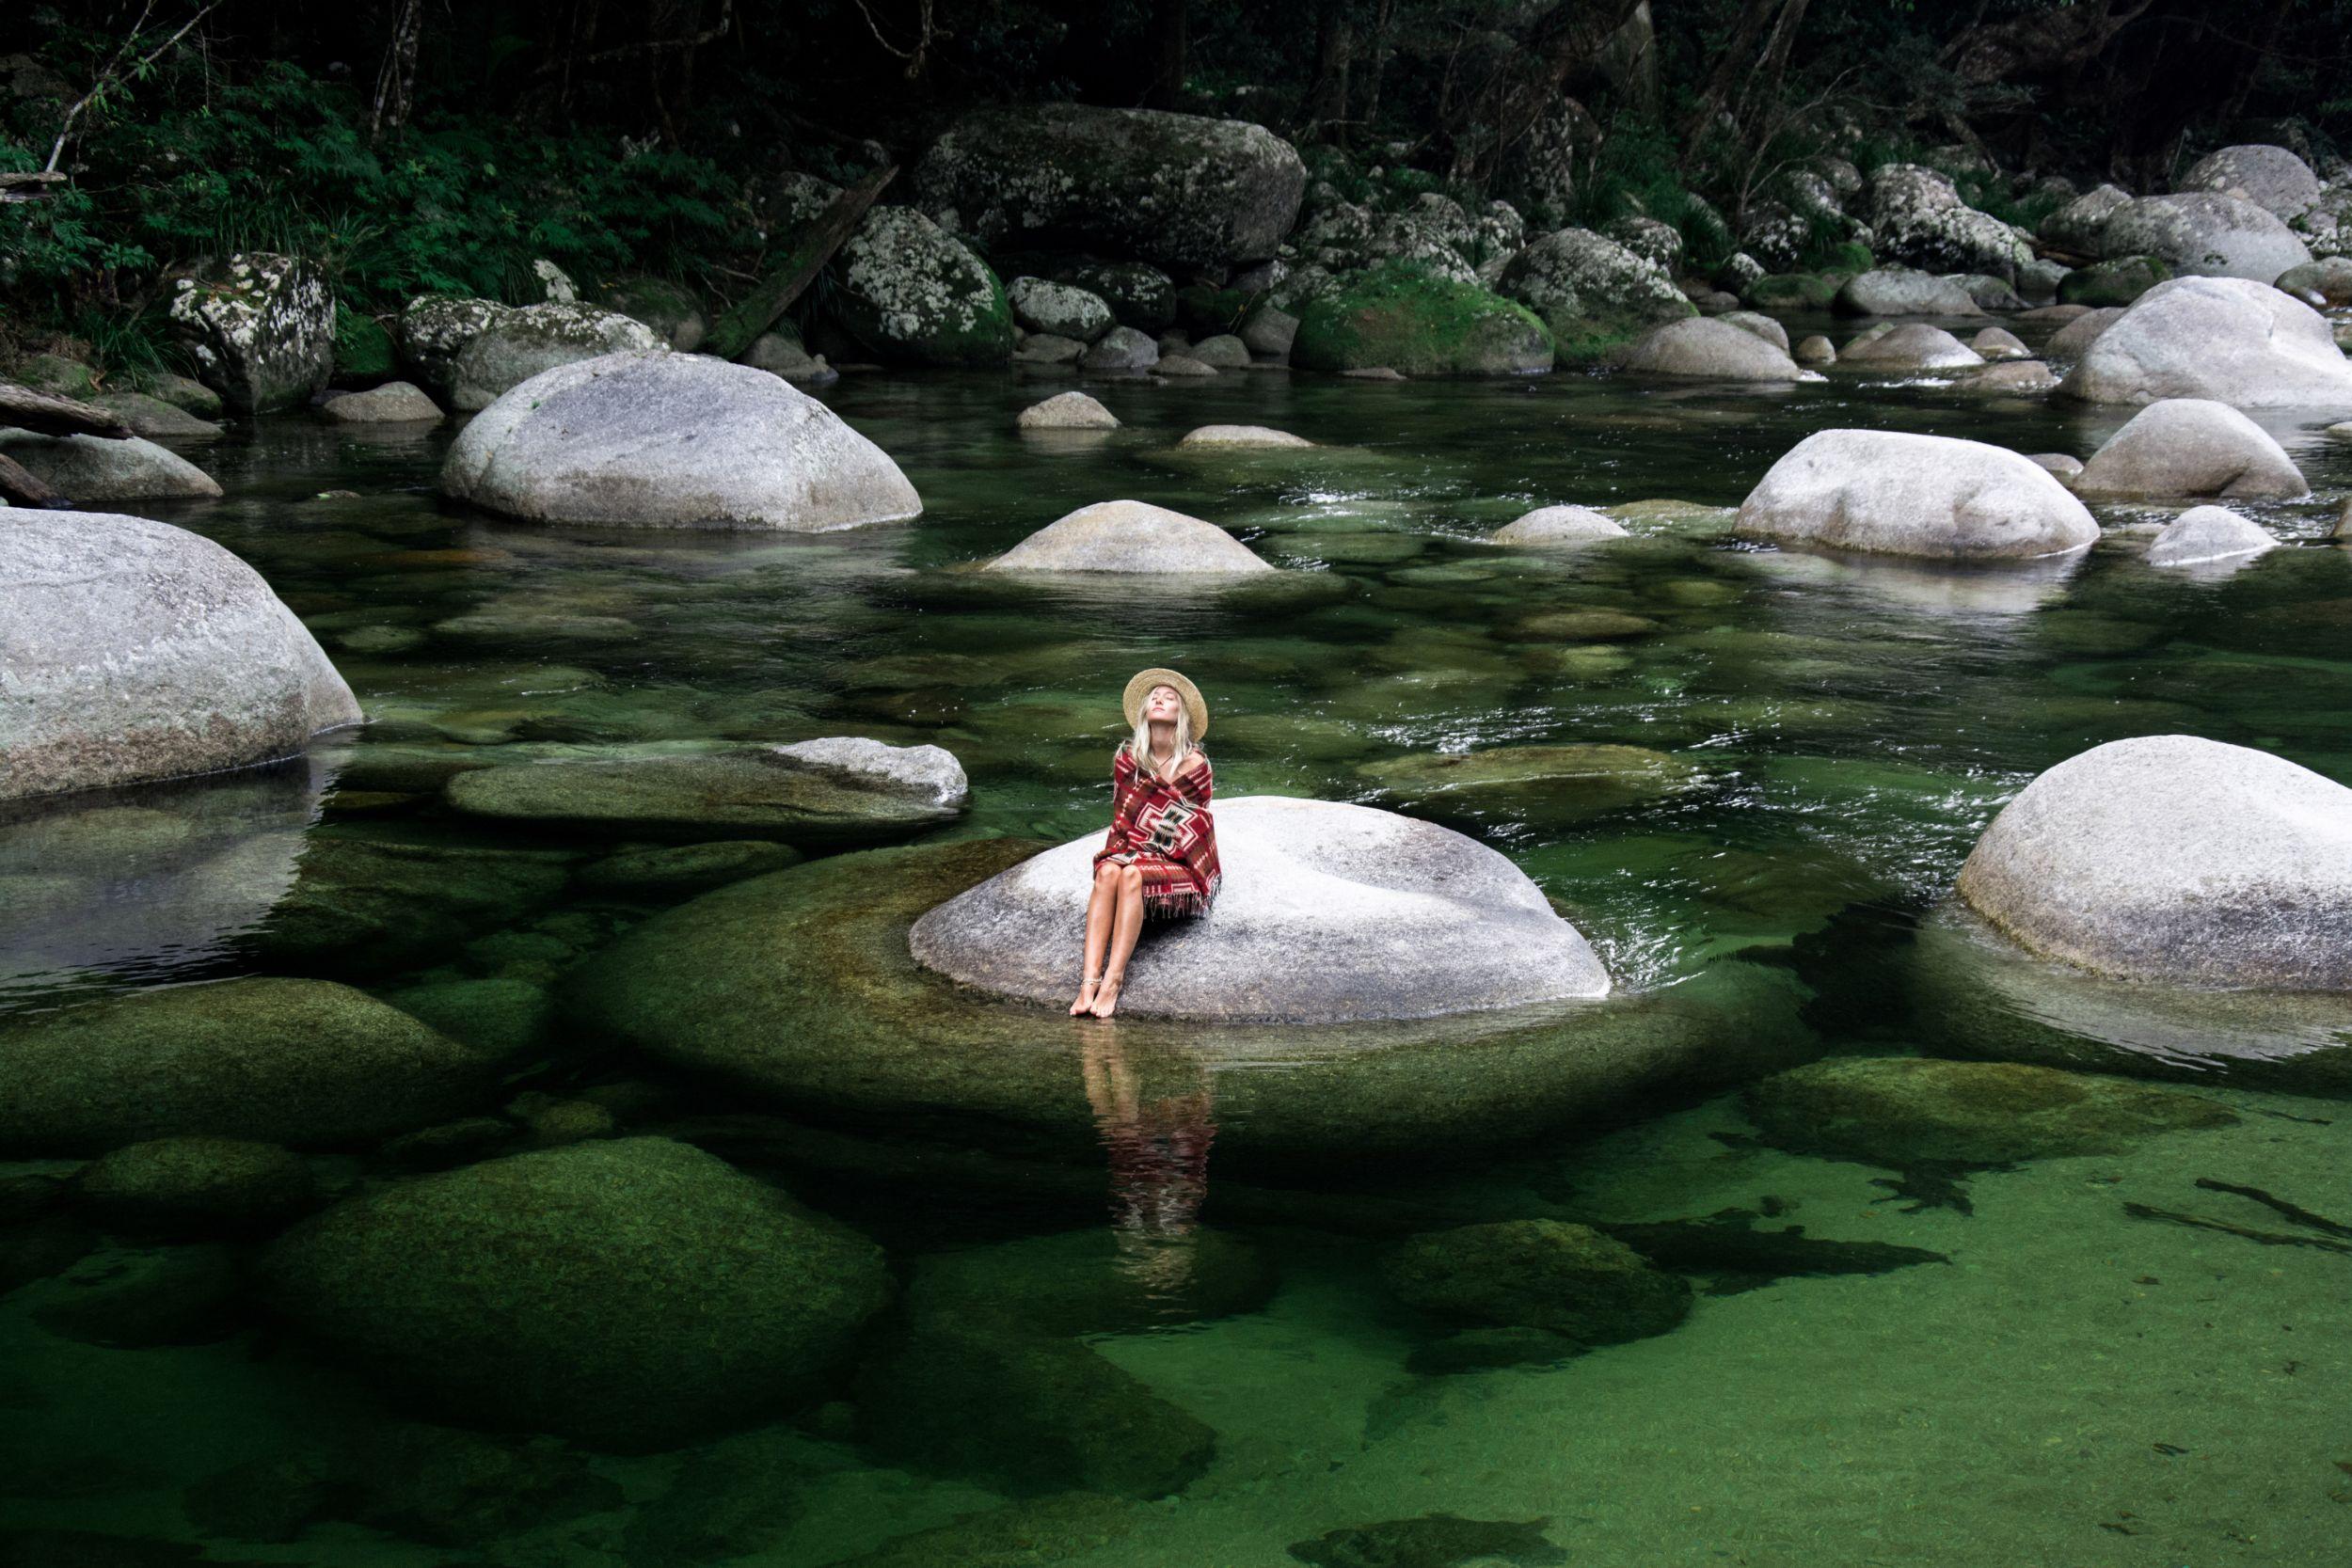 Silky-Oaks-Lodge_The-Daintree_Mossman-Gorge-Woman.jpg